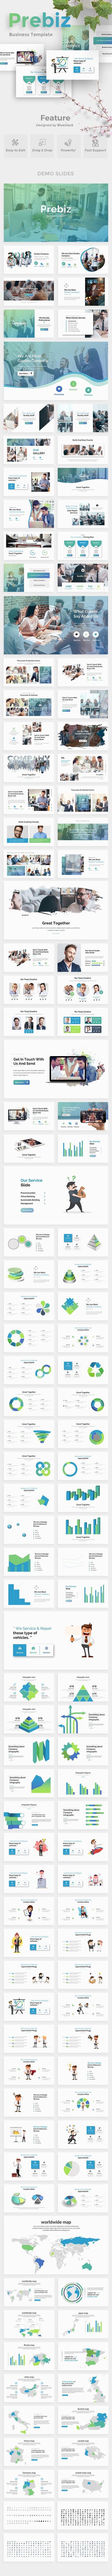 Prebiz Business Keynote Template - Creative Keynote Templates